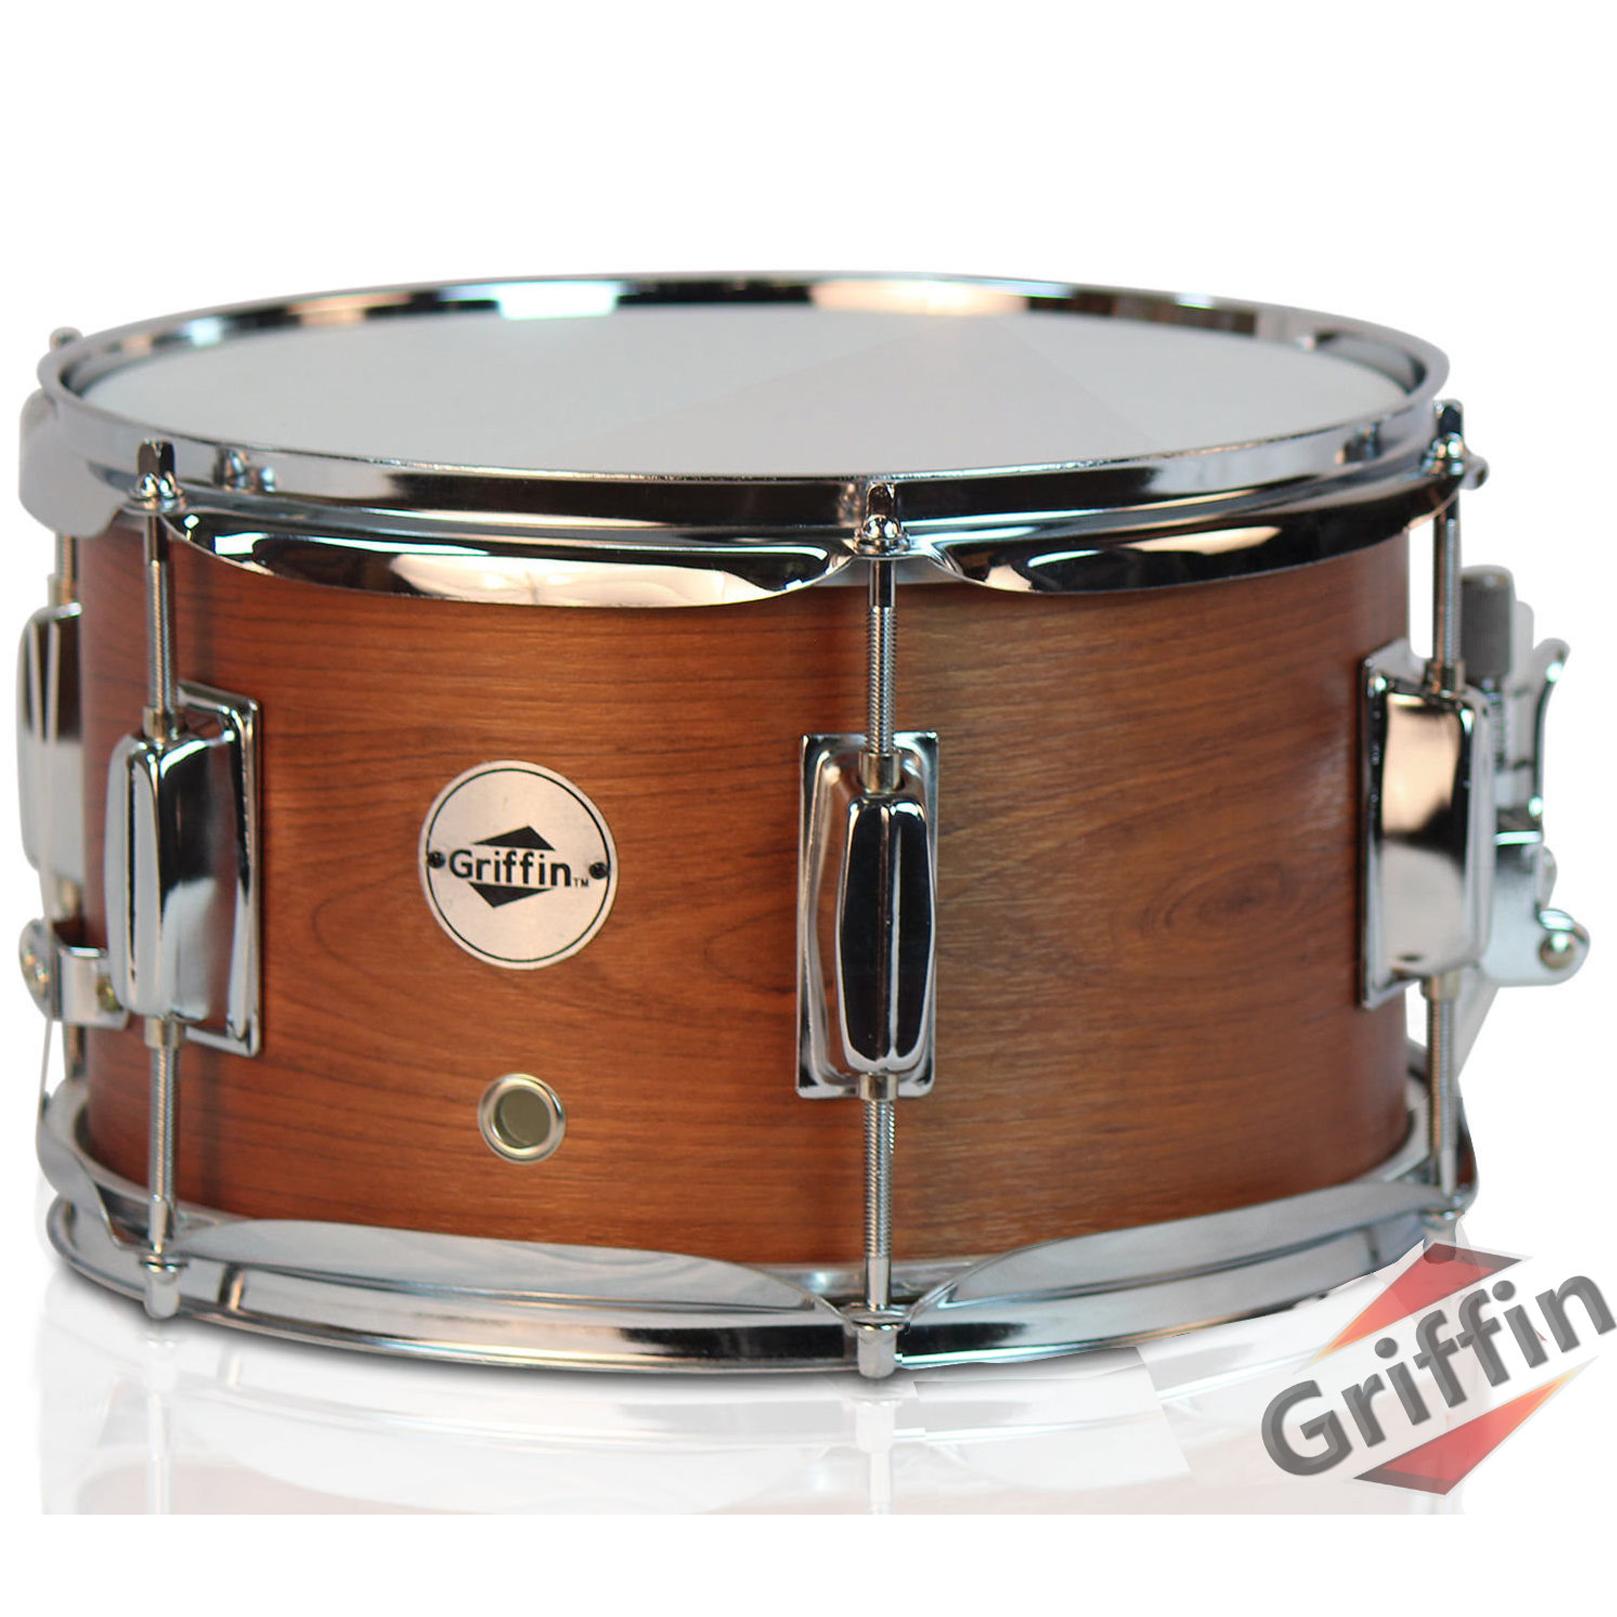 griffin firecracker snare drum popcorn 10x6 poplar wood shell percussion ebay. Black Bedroom Furniture Sets. Home Design Ideas